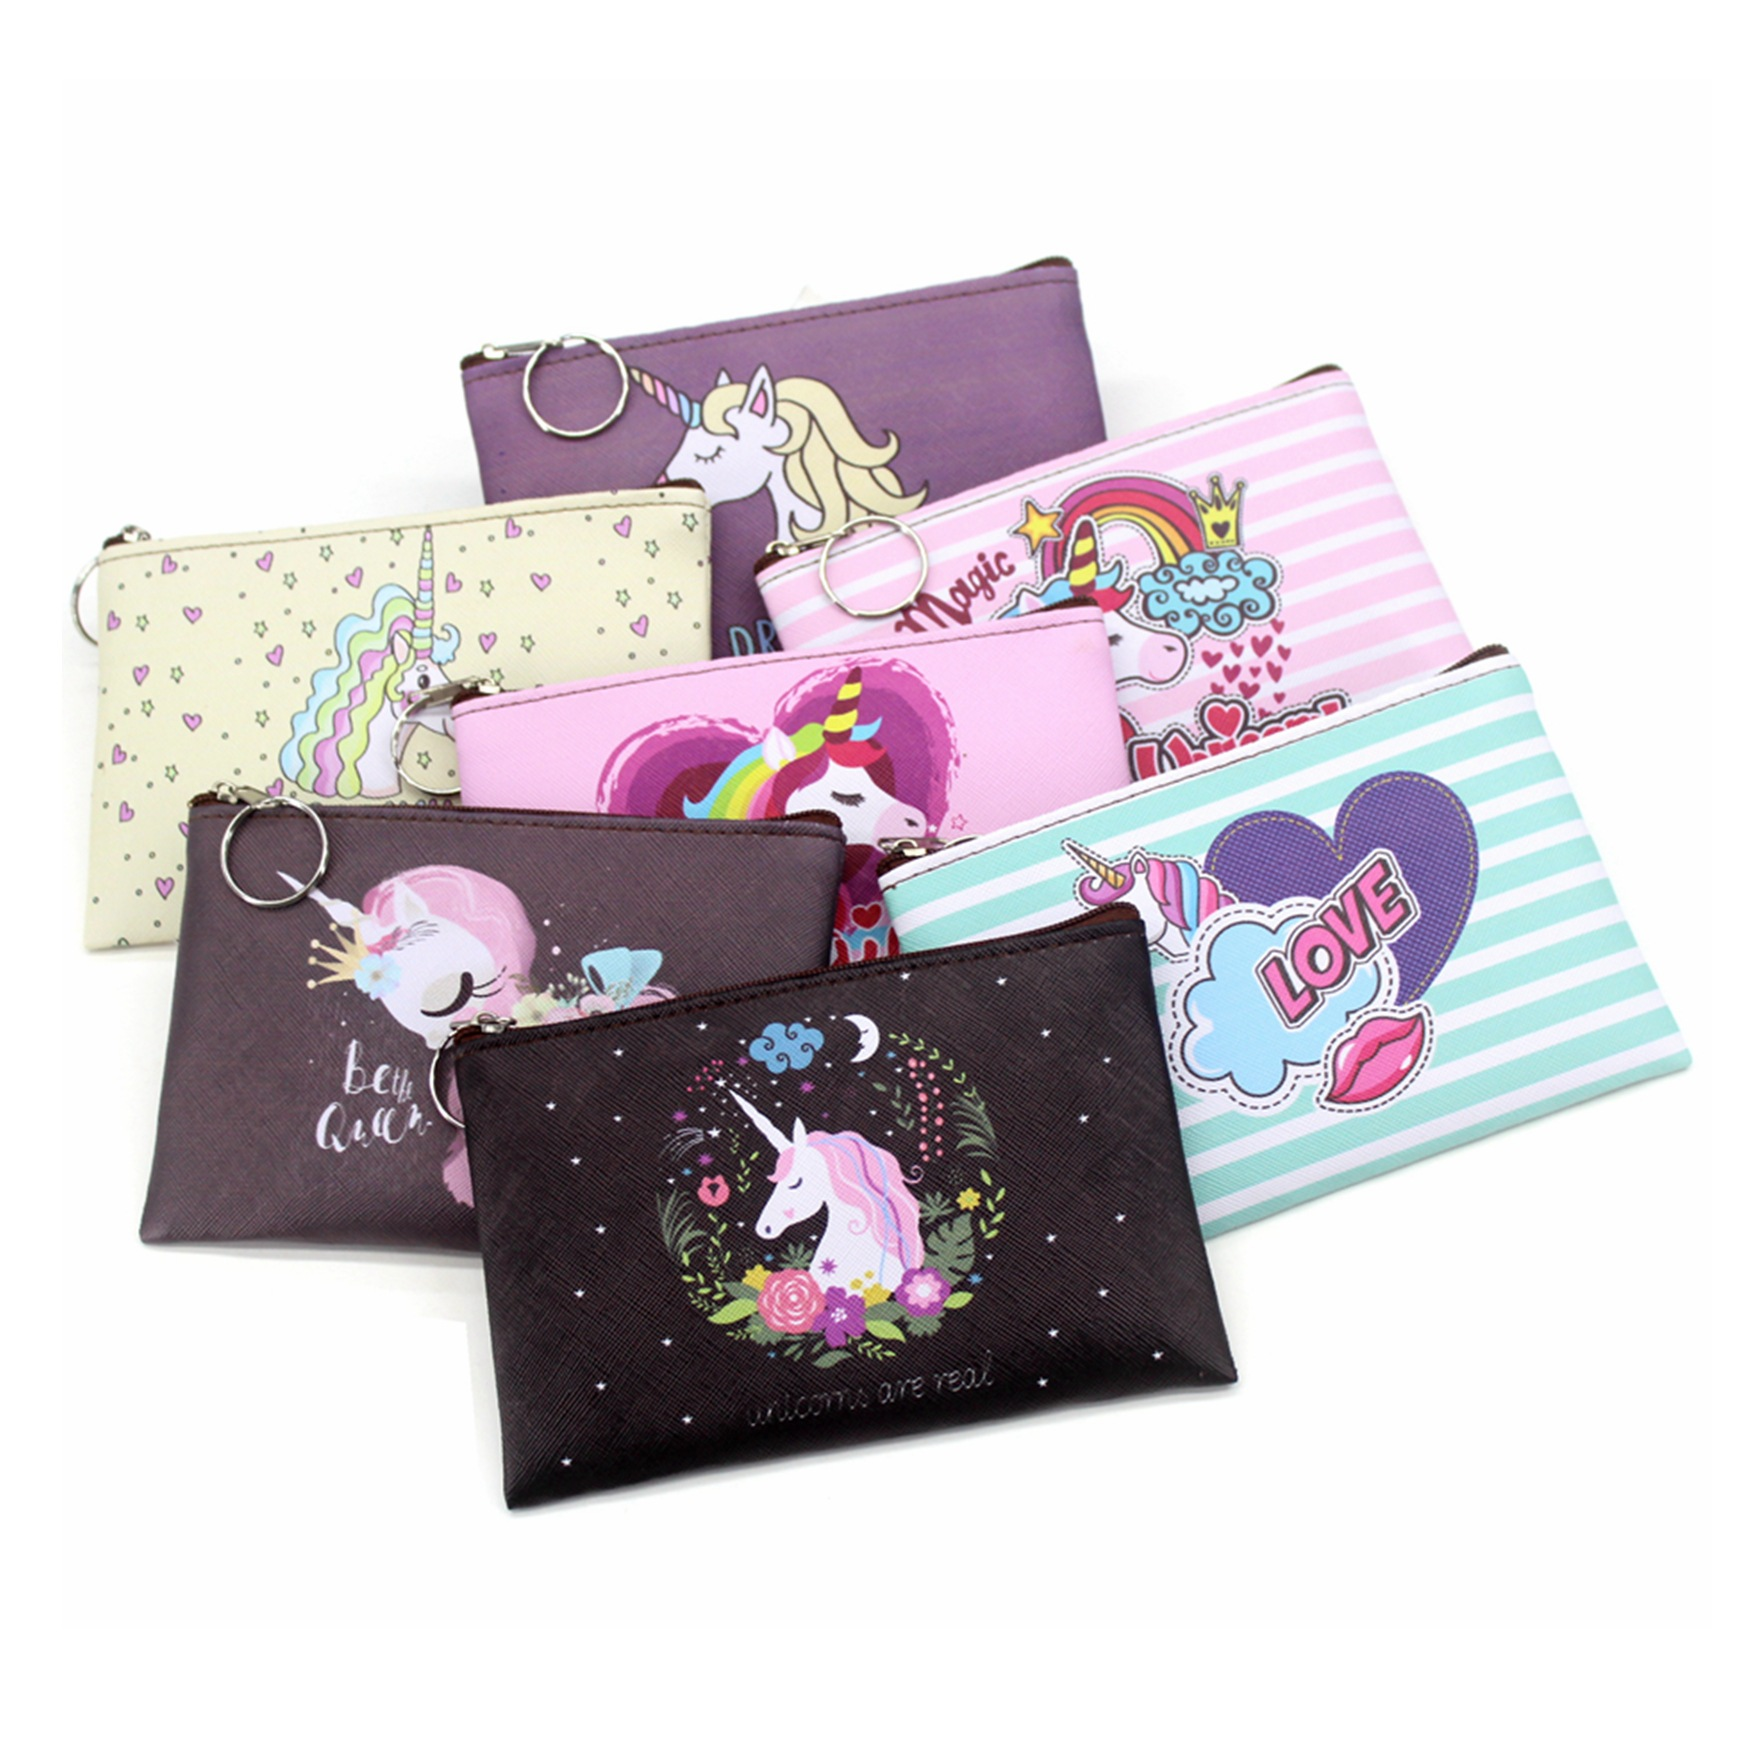 Dibujos Animados unicornio moneda monederos mujeres mini billeteras lindo tarjetero señoras llave dinero bolsas para niñas monedero mujeres niños bolsa